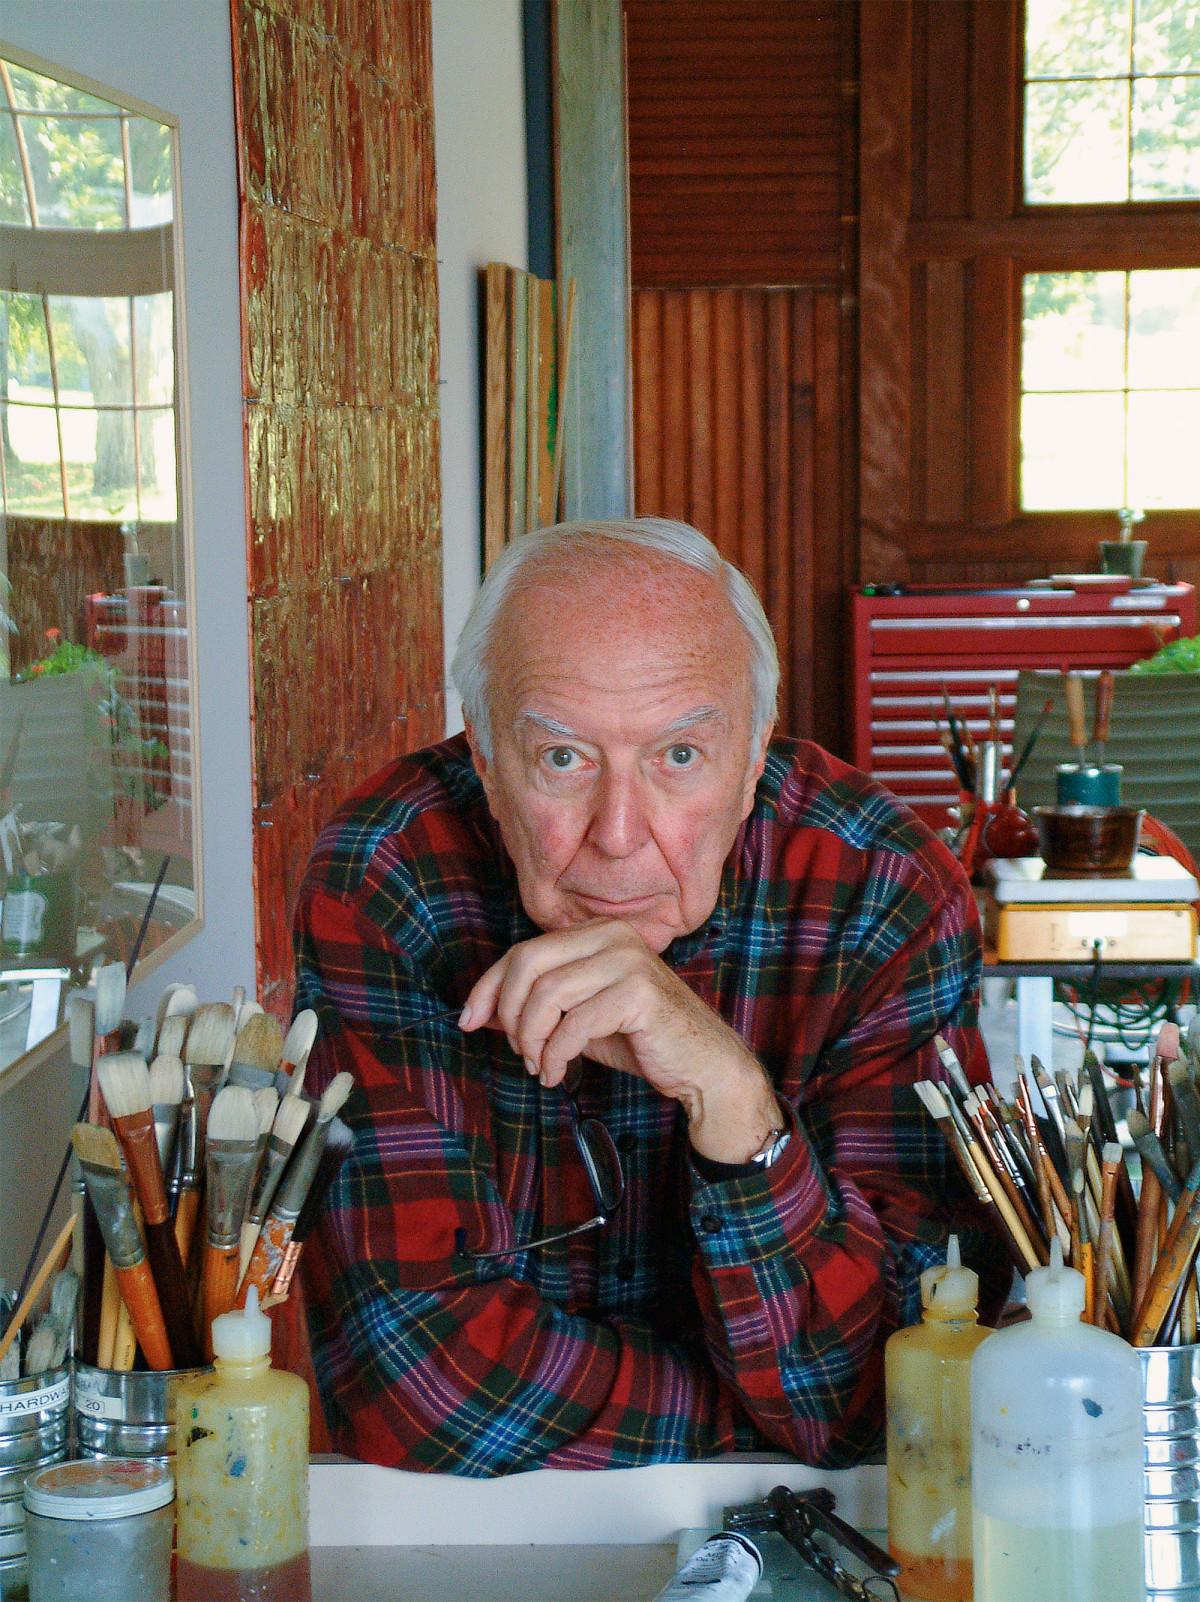 Jasper John - Photo: John Lund